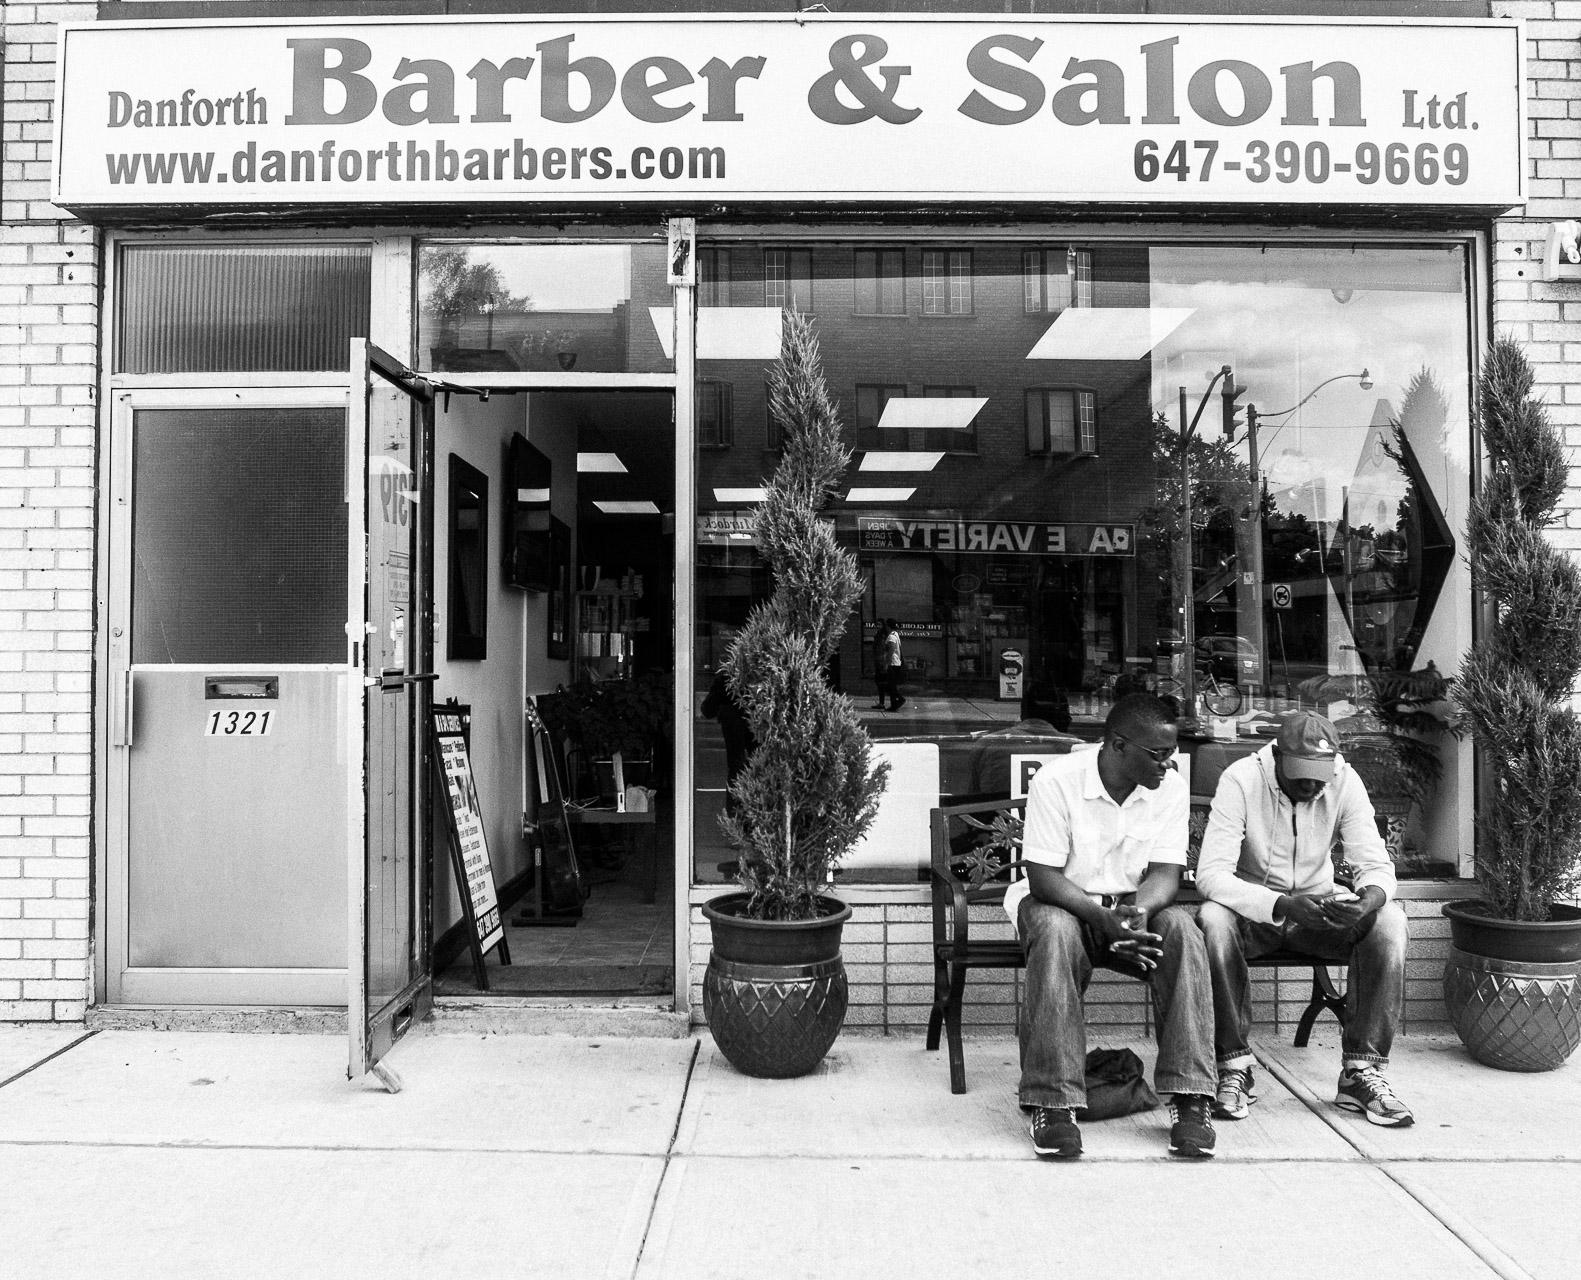 Barbershop Chronicles